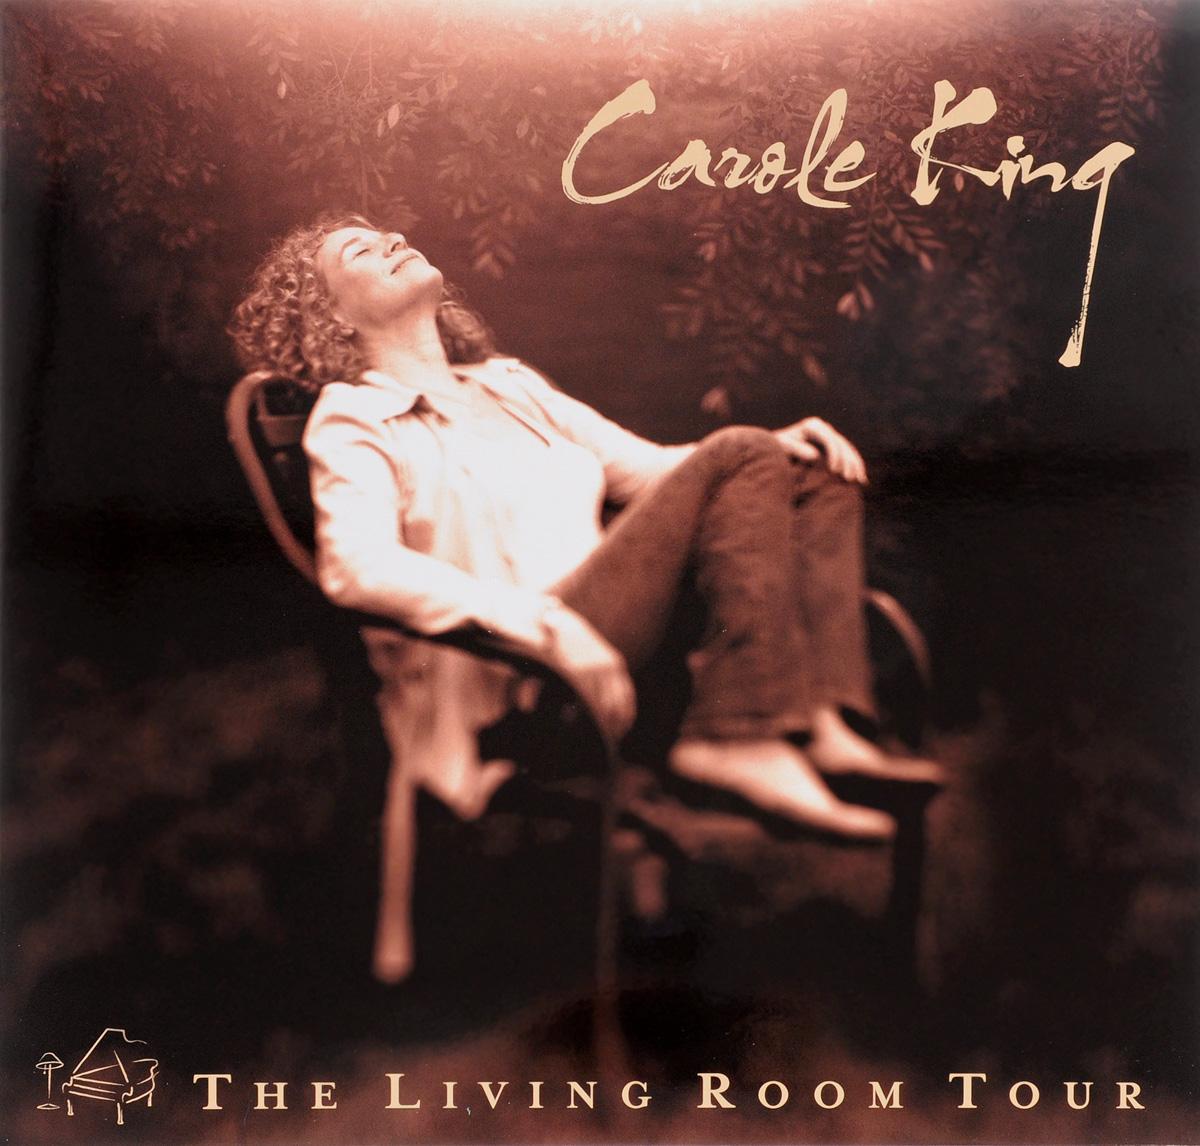 Кэрол Кинг Carole King. Living Room Tour (2 LP) carole king carole king her greatest hits